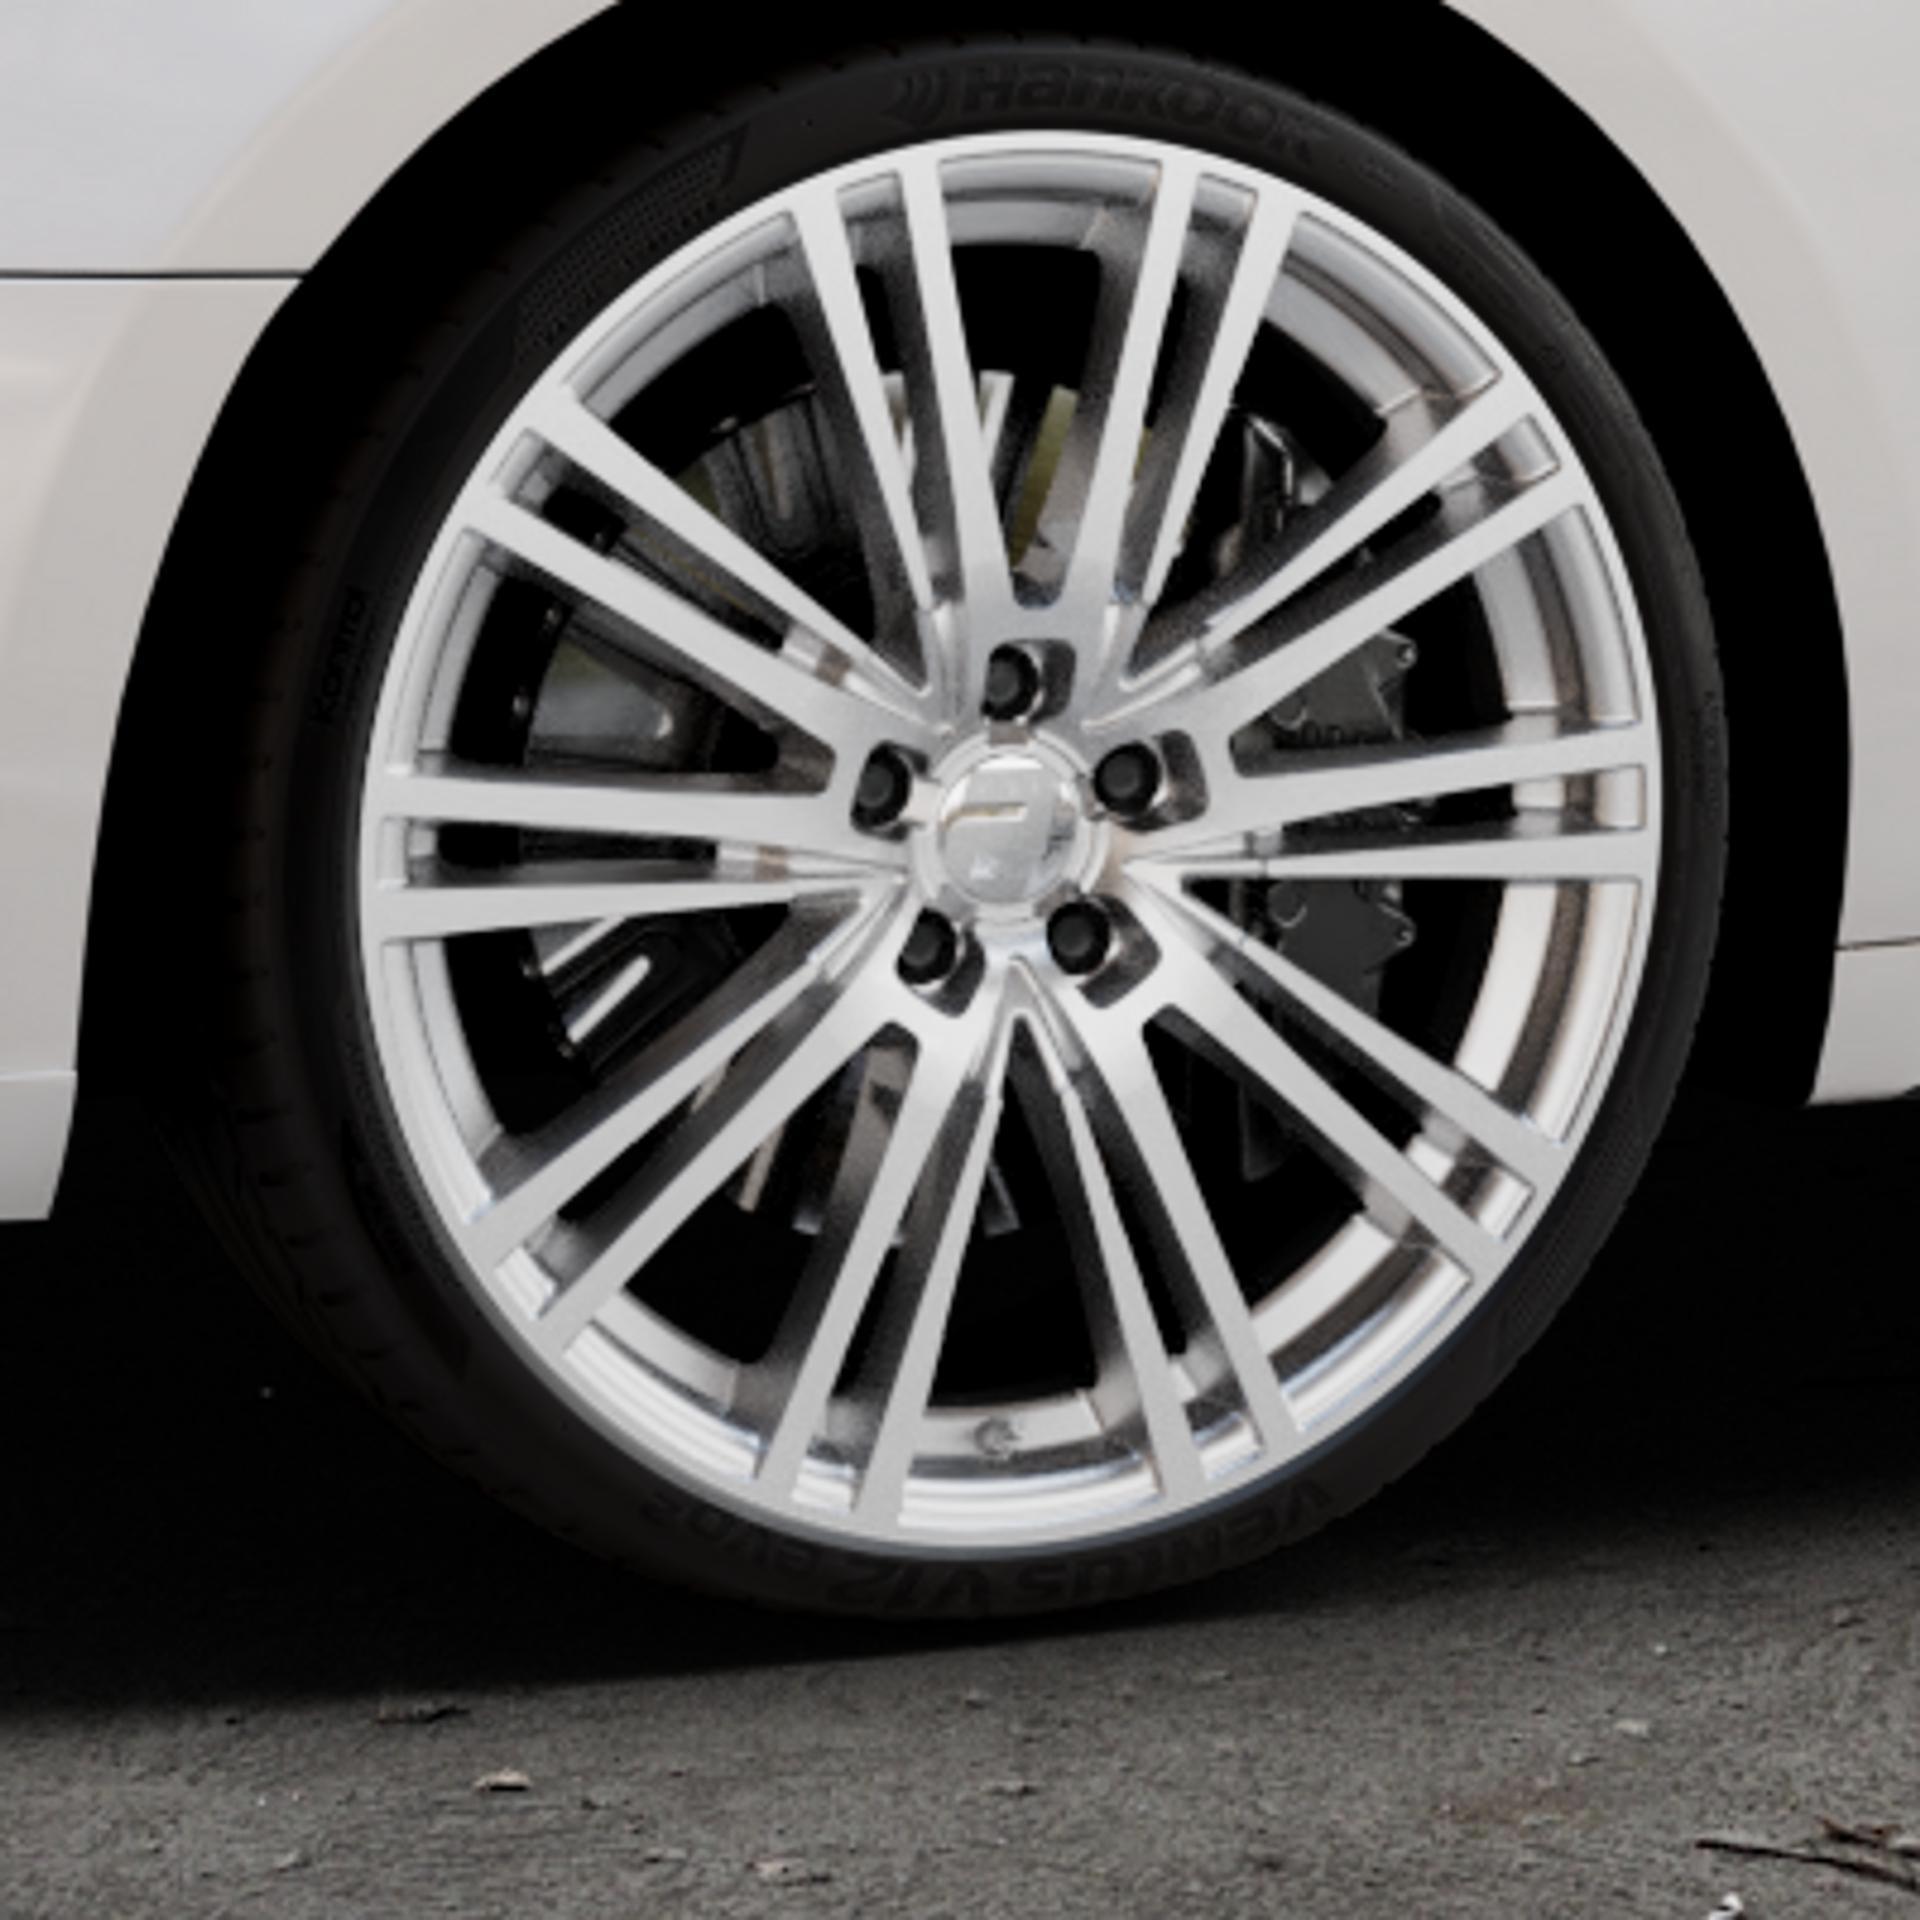 2DRV WH18 Race Silber lackiert Felge mit Reifen in 20Zoll Winterfelge Alufelge auf weissem Audi A5 Typ B9 (Sportback) 2,0l TDI 140kW (190 PS) quattro TFSI 185kW (252 3,0l 160kW (218 200kW (272 1,4l 110kW (150 183kW (249 g-tron 125kW (170 Mild-Hybrid 100kW (136 210kW (286 45 180kW (245 35 40 50 170kW (231 120kW (163 30 ⬇️ mit 15mm Ti